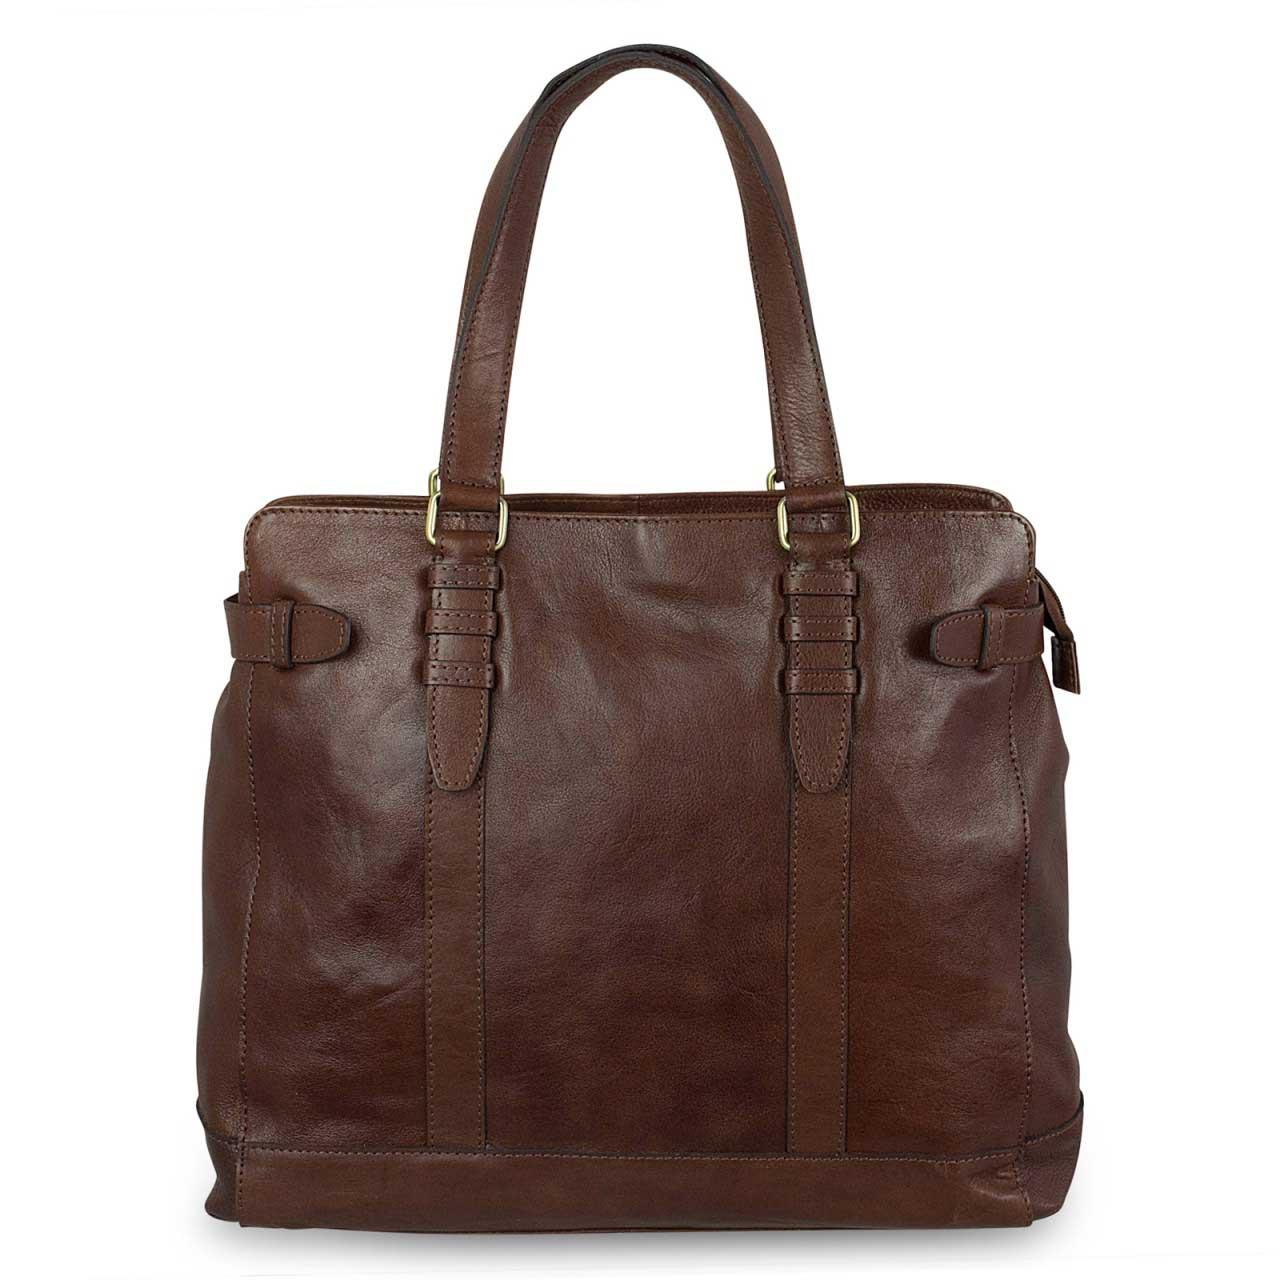 STILORD Große Damenhandtasche Leder 34 x 35 x 9 cm dunkelbraun - Bild 6